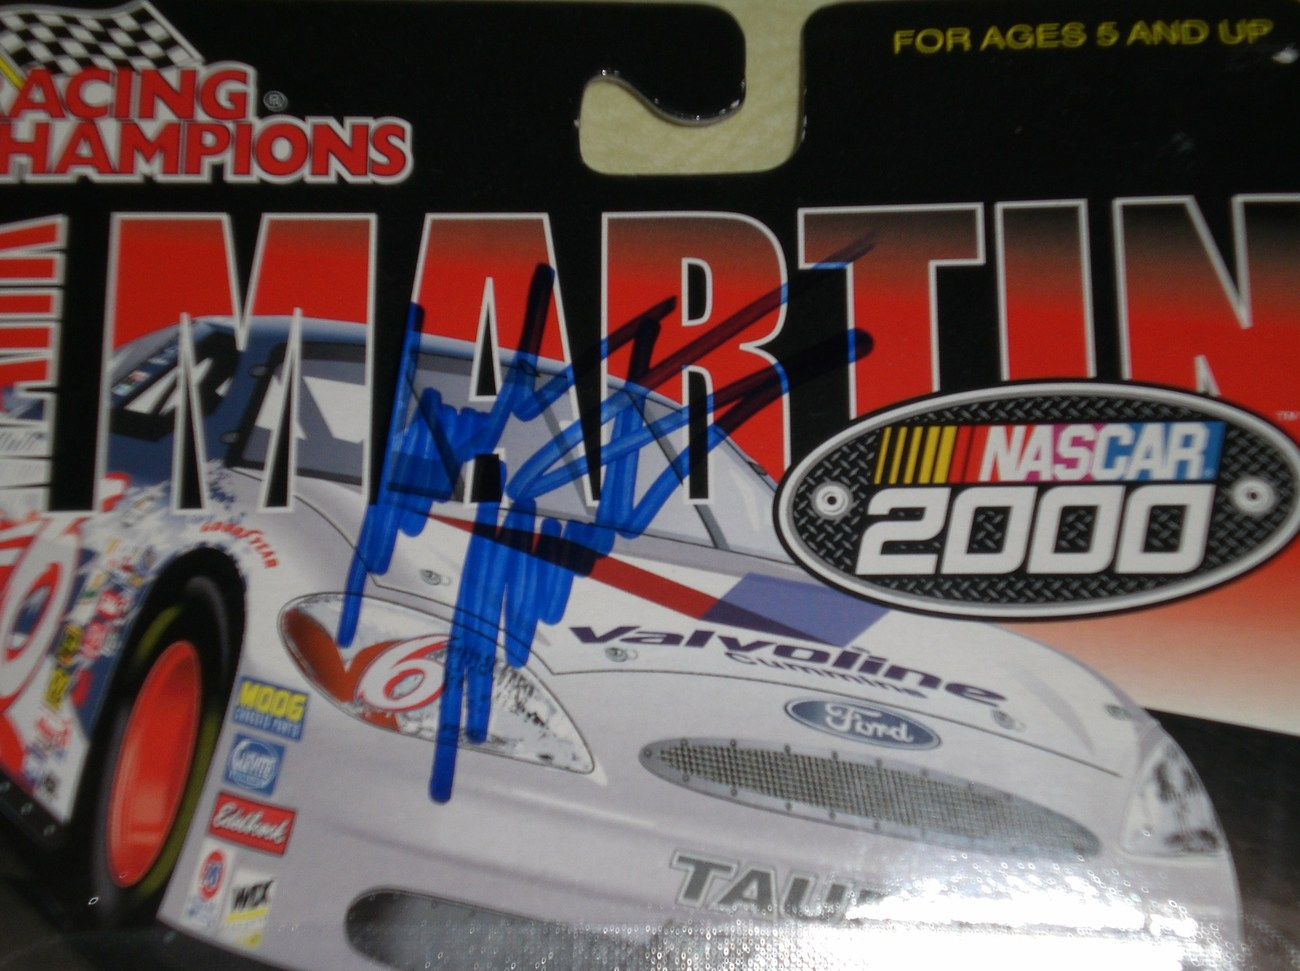 Mark Martin AUTOGRAPHED 1/64 Nascar diecast car image 2